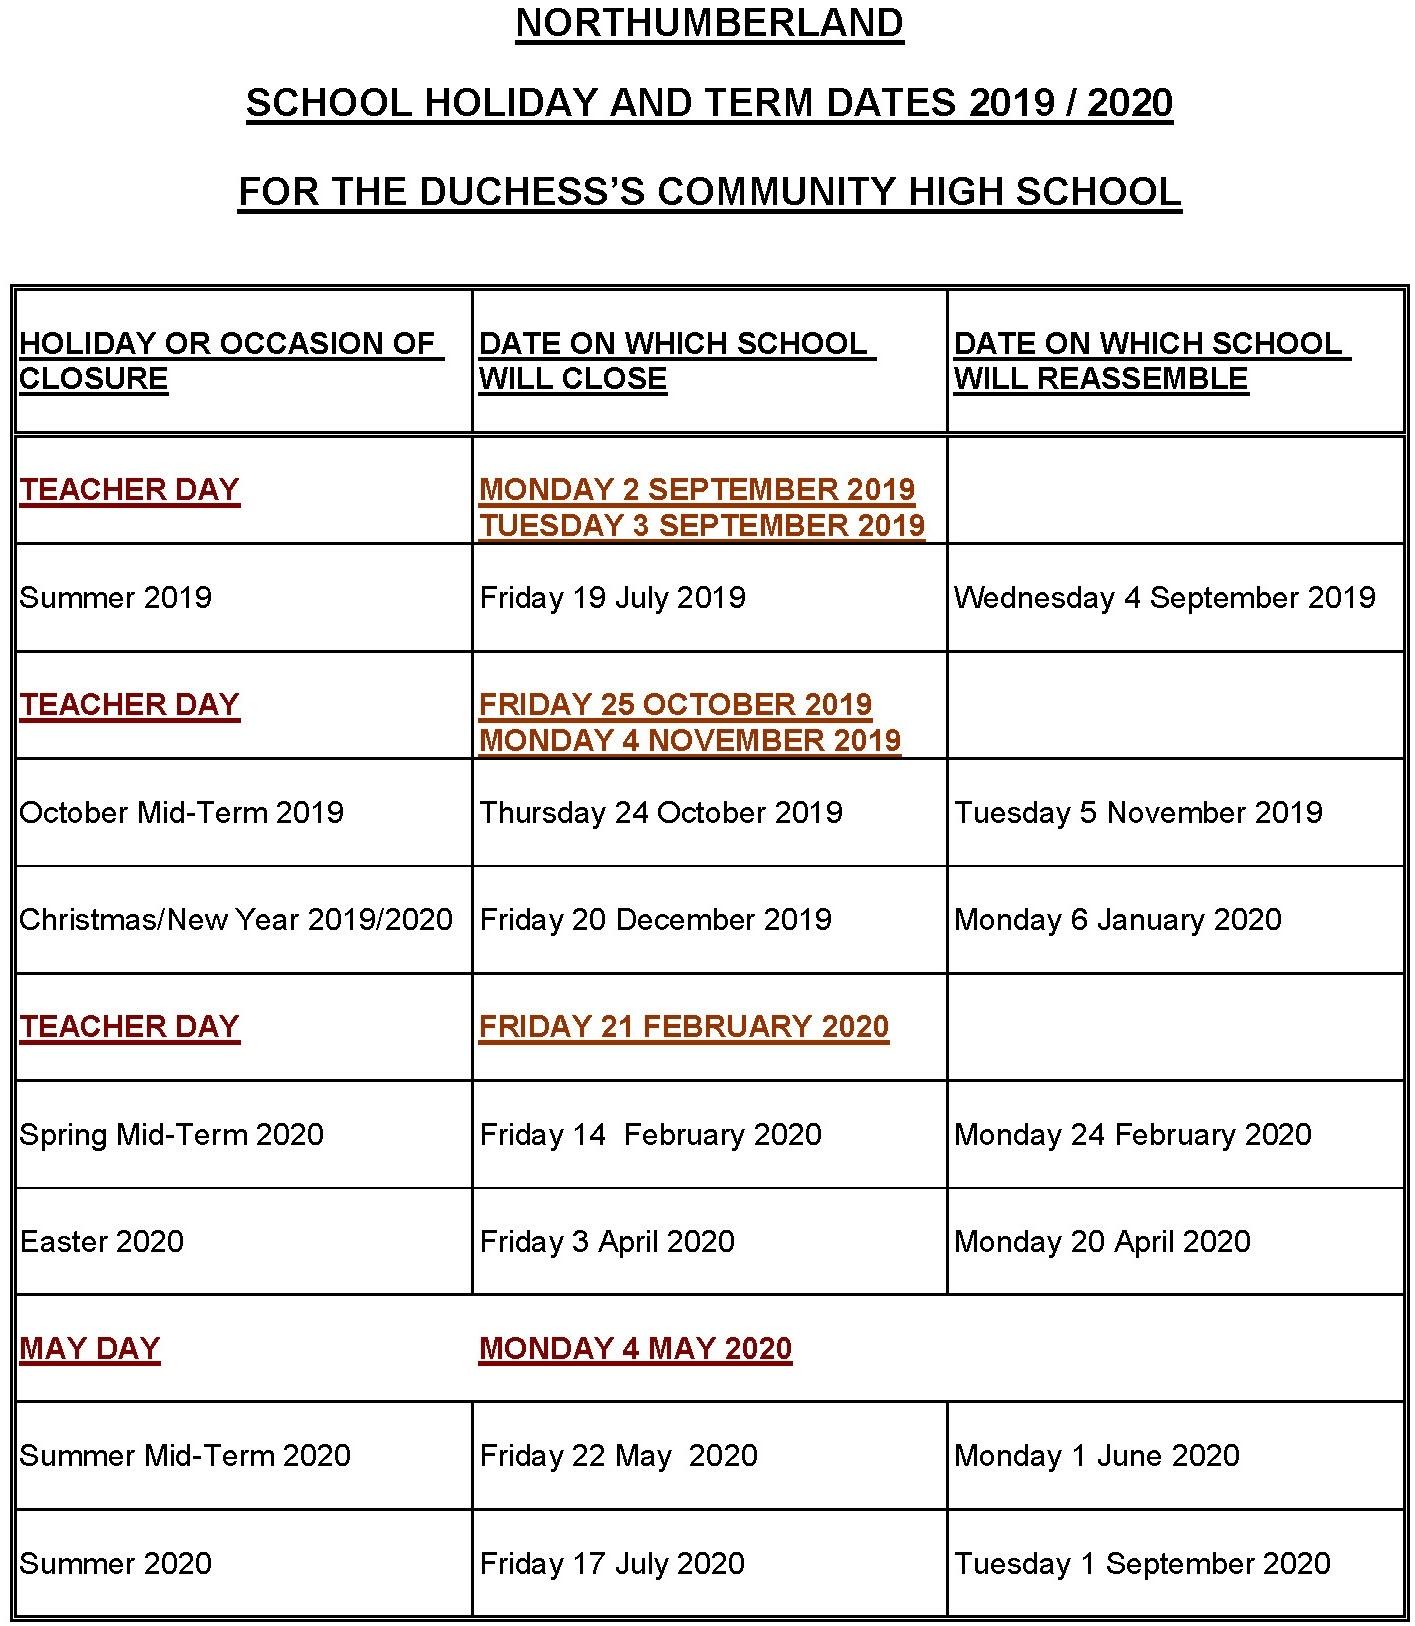 Term Dates :: The Duchess's Community High School Impressive Easter 2020 Calendar Date